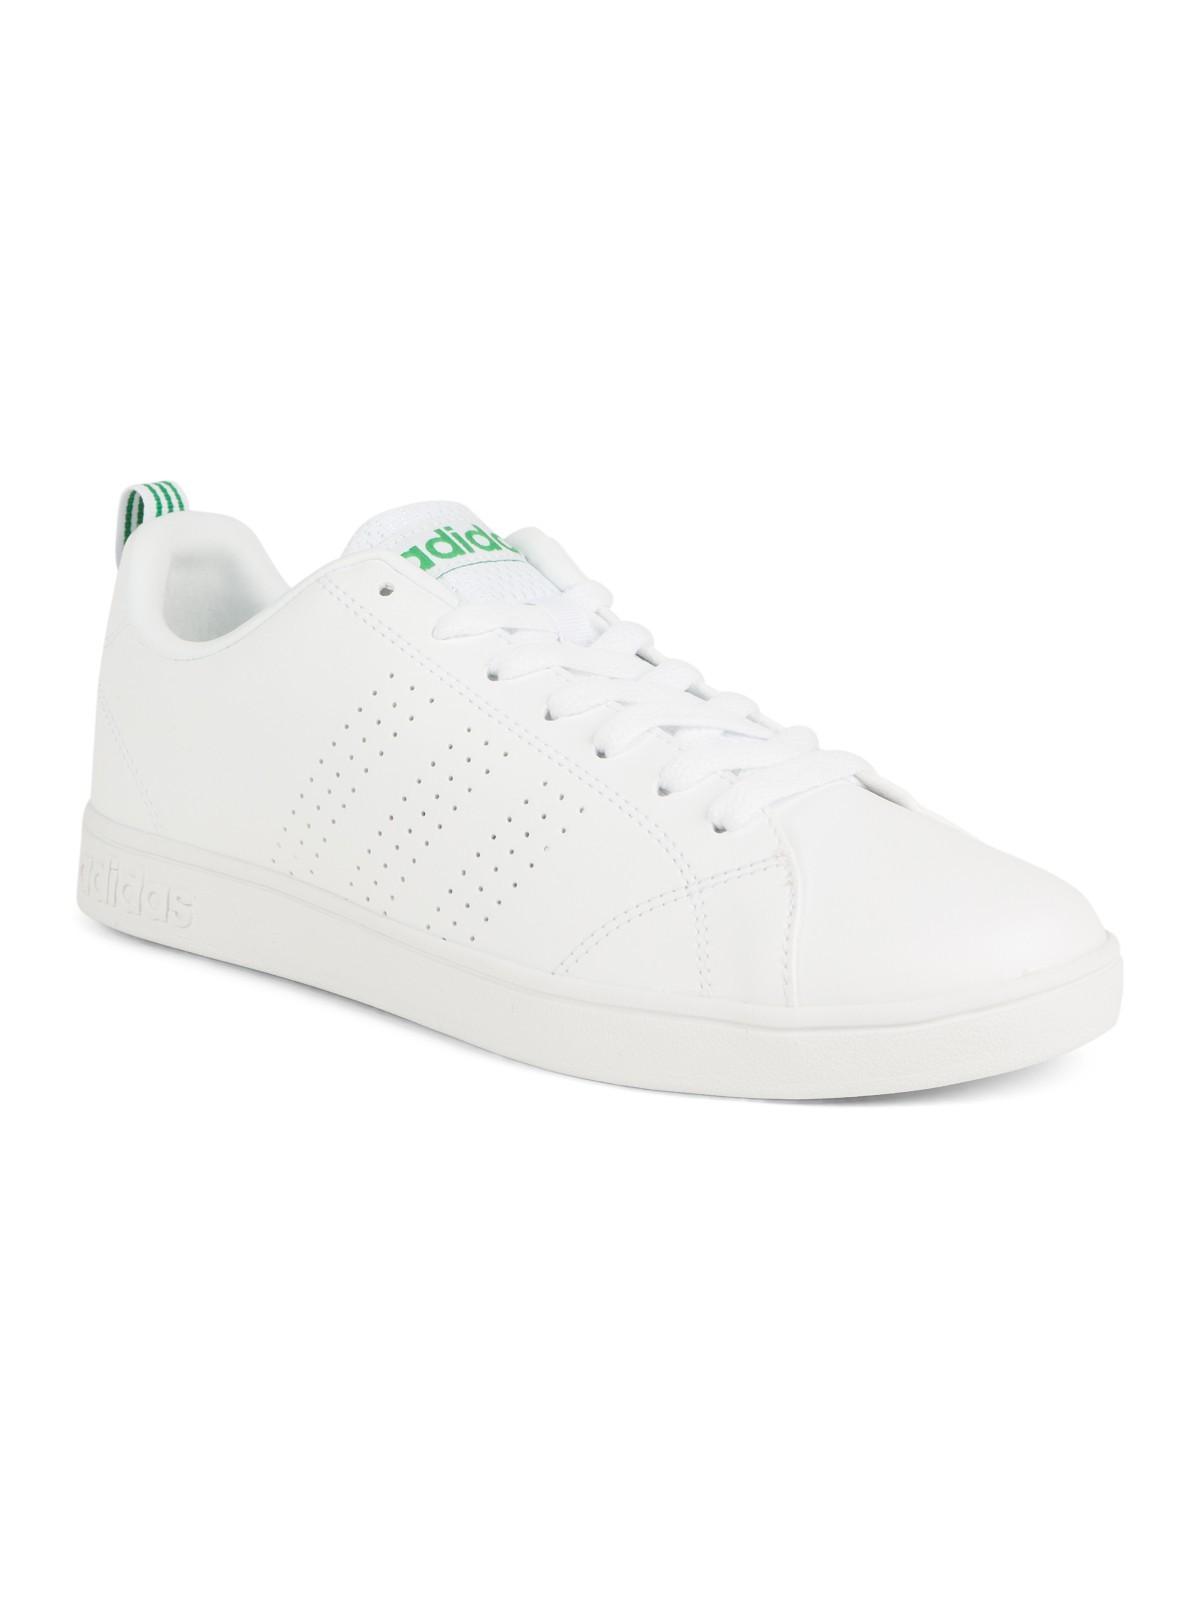 adidas neo blanche